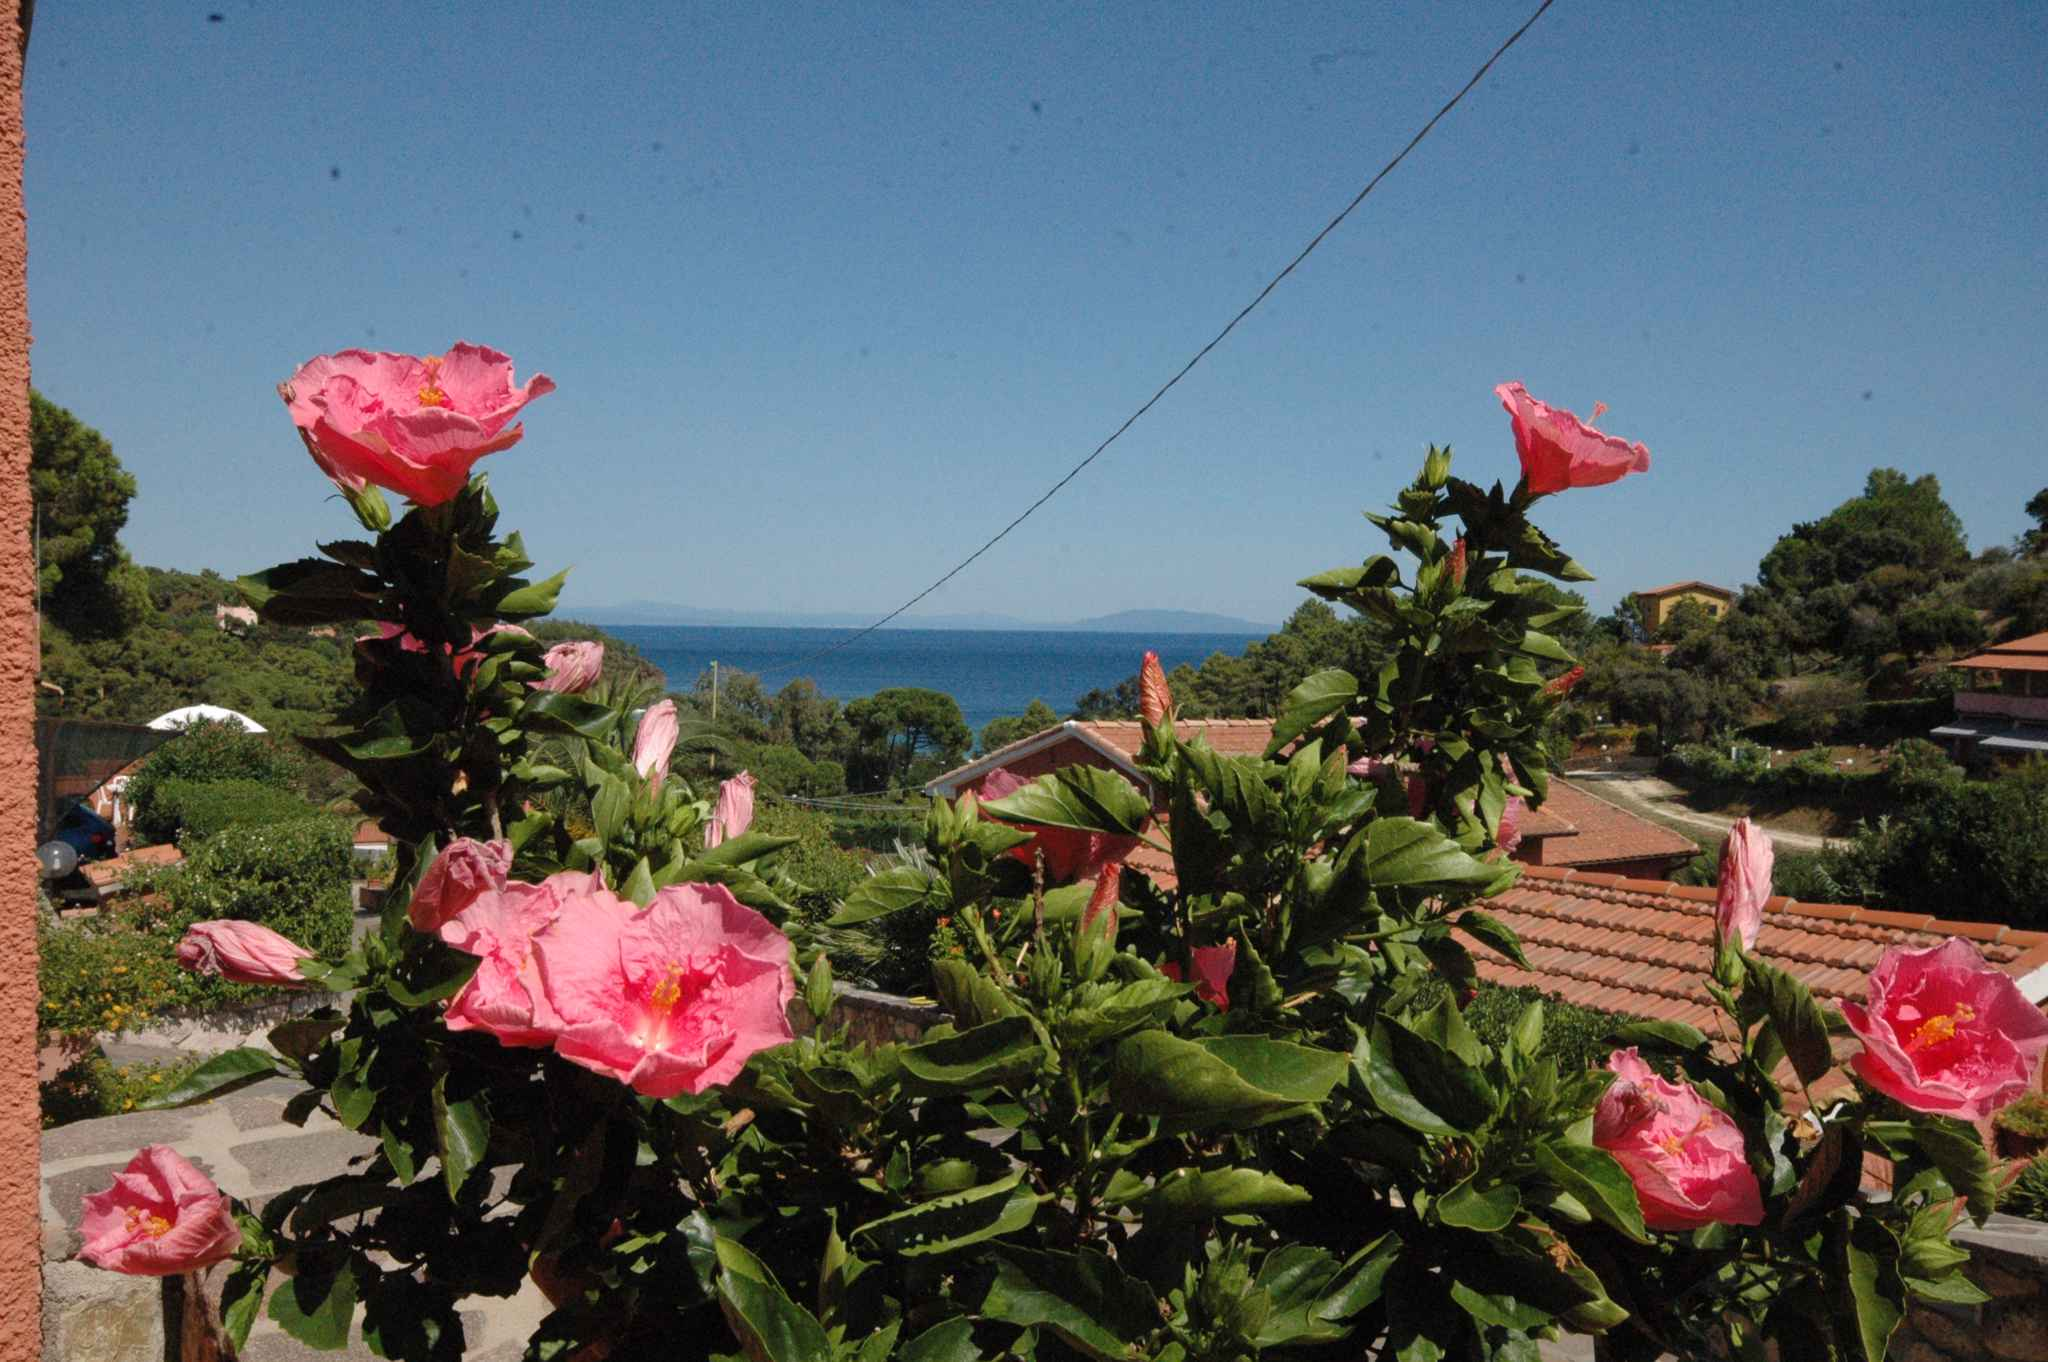 Ferienwohnung mit Panoramablick (404925), Capoliveri, Elba, Toskana, Italien, Bild 7